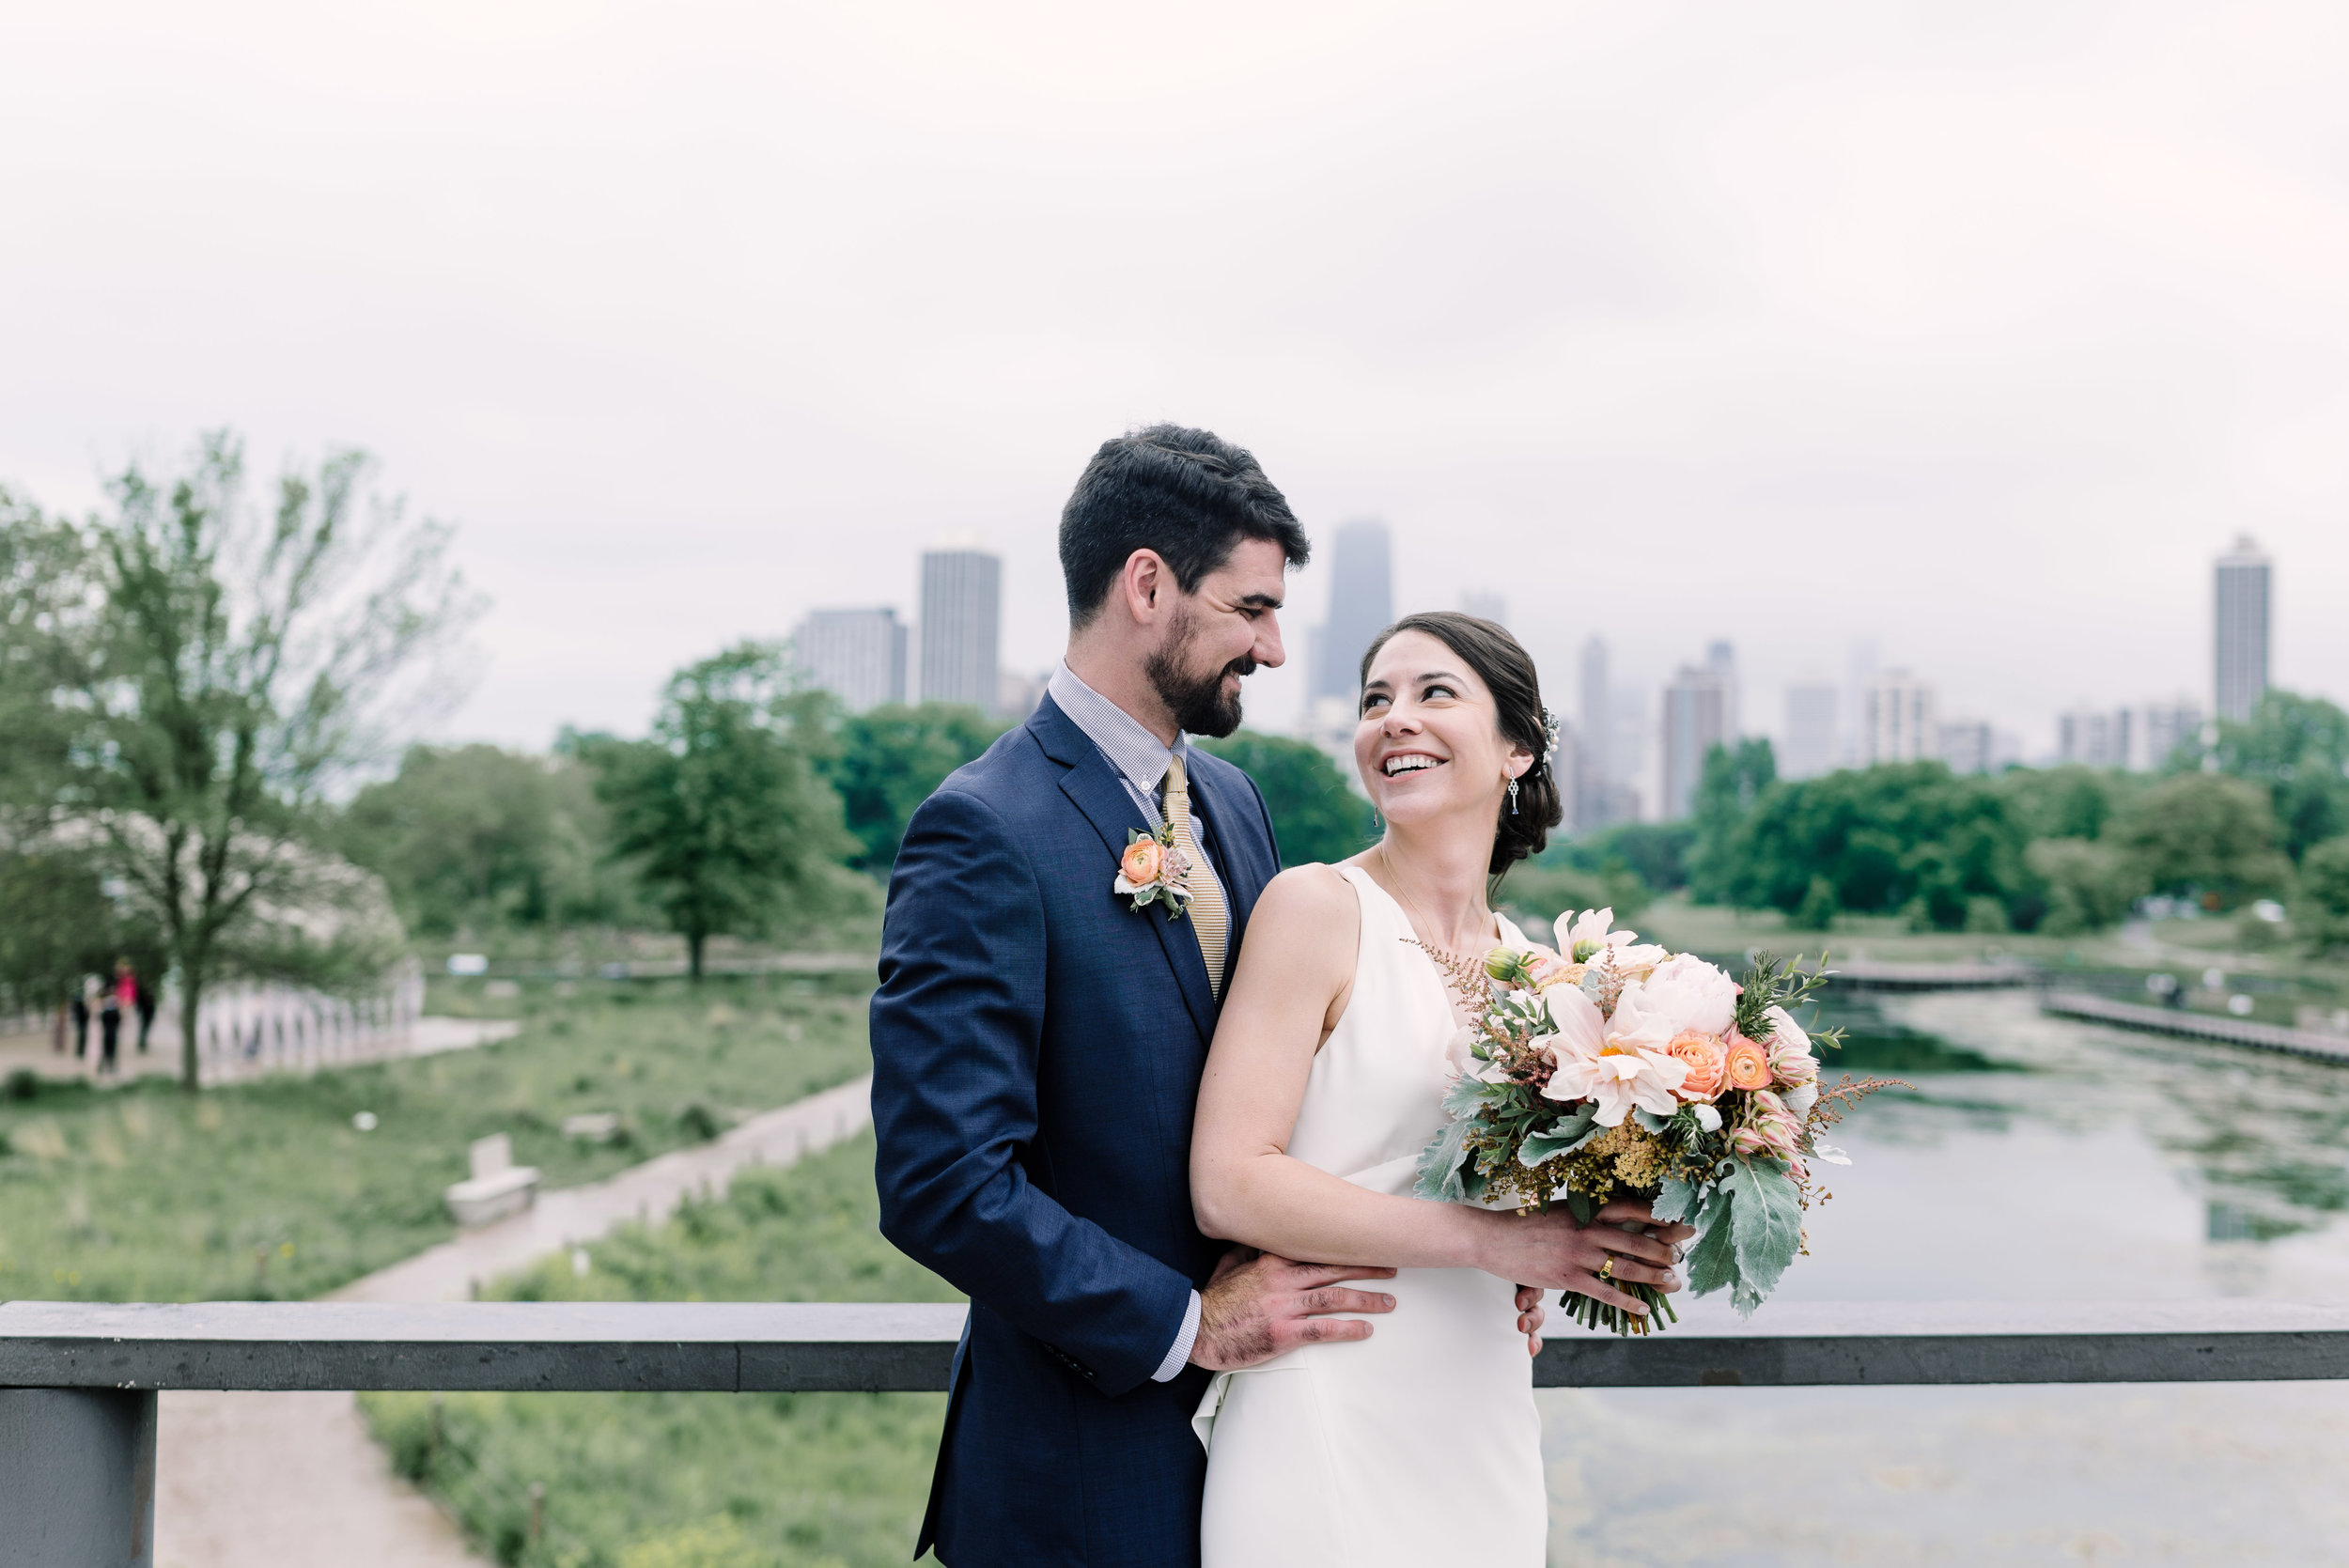 Patricia-Steve-Blog-Indianapolis-Wedding-40.jpg